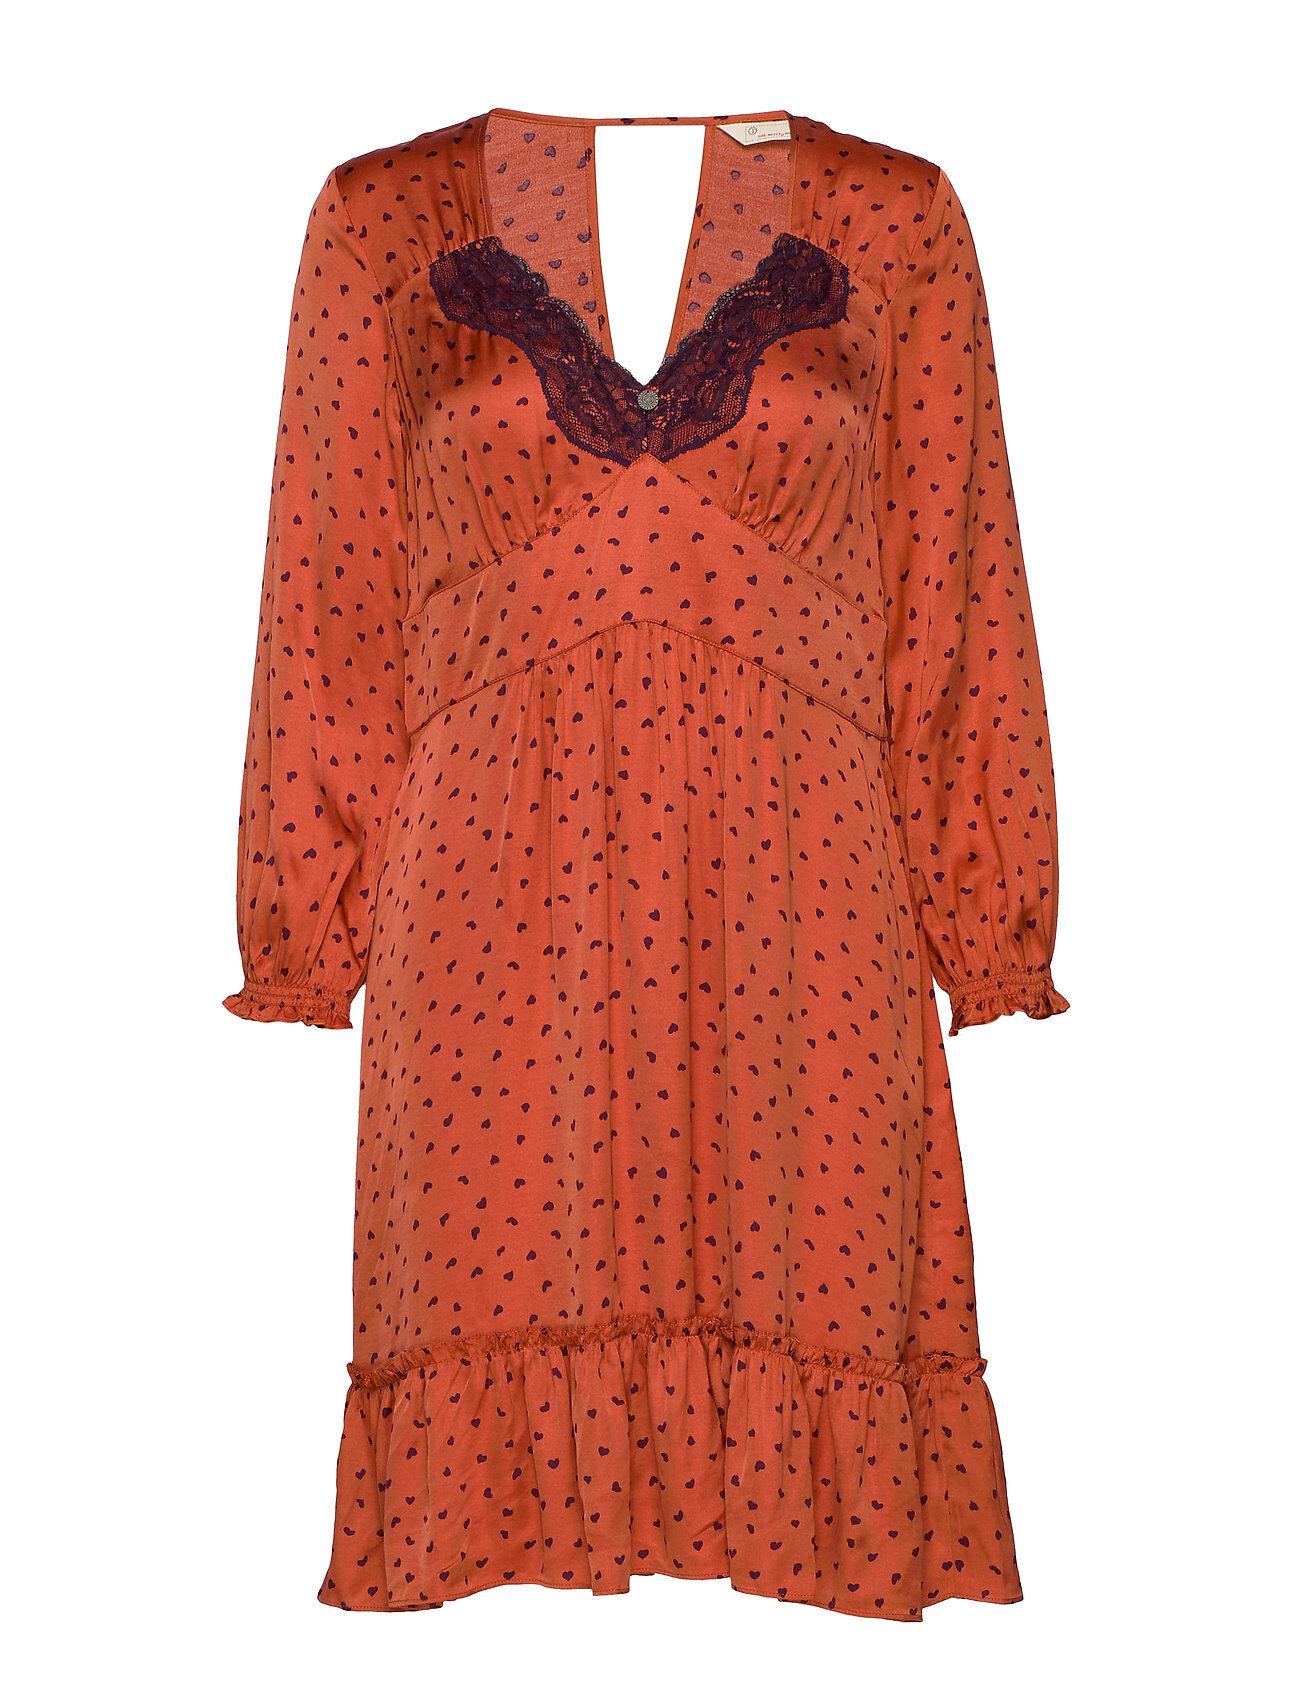 Image of ODD MOLLY Hello New Love Dress Polvipituinen Mekko Oranssi ODD MOLLY